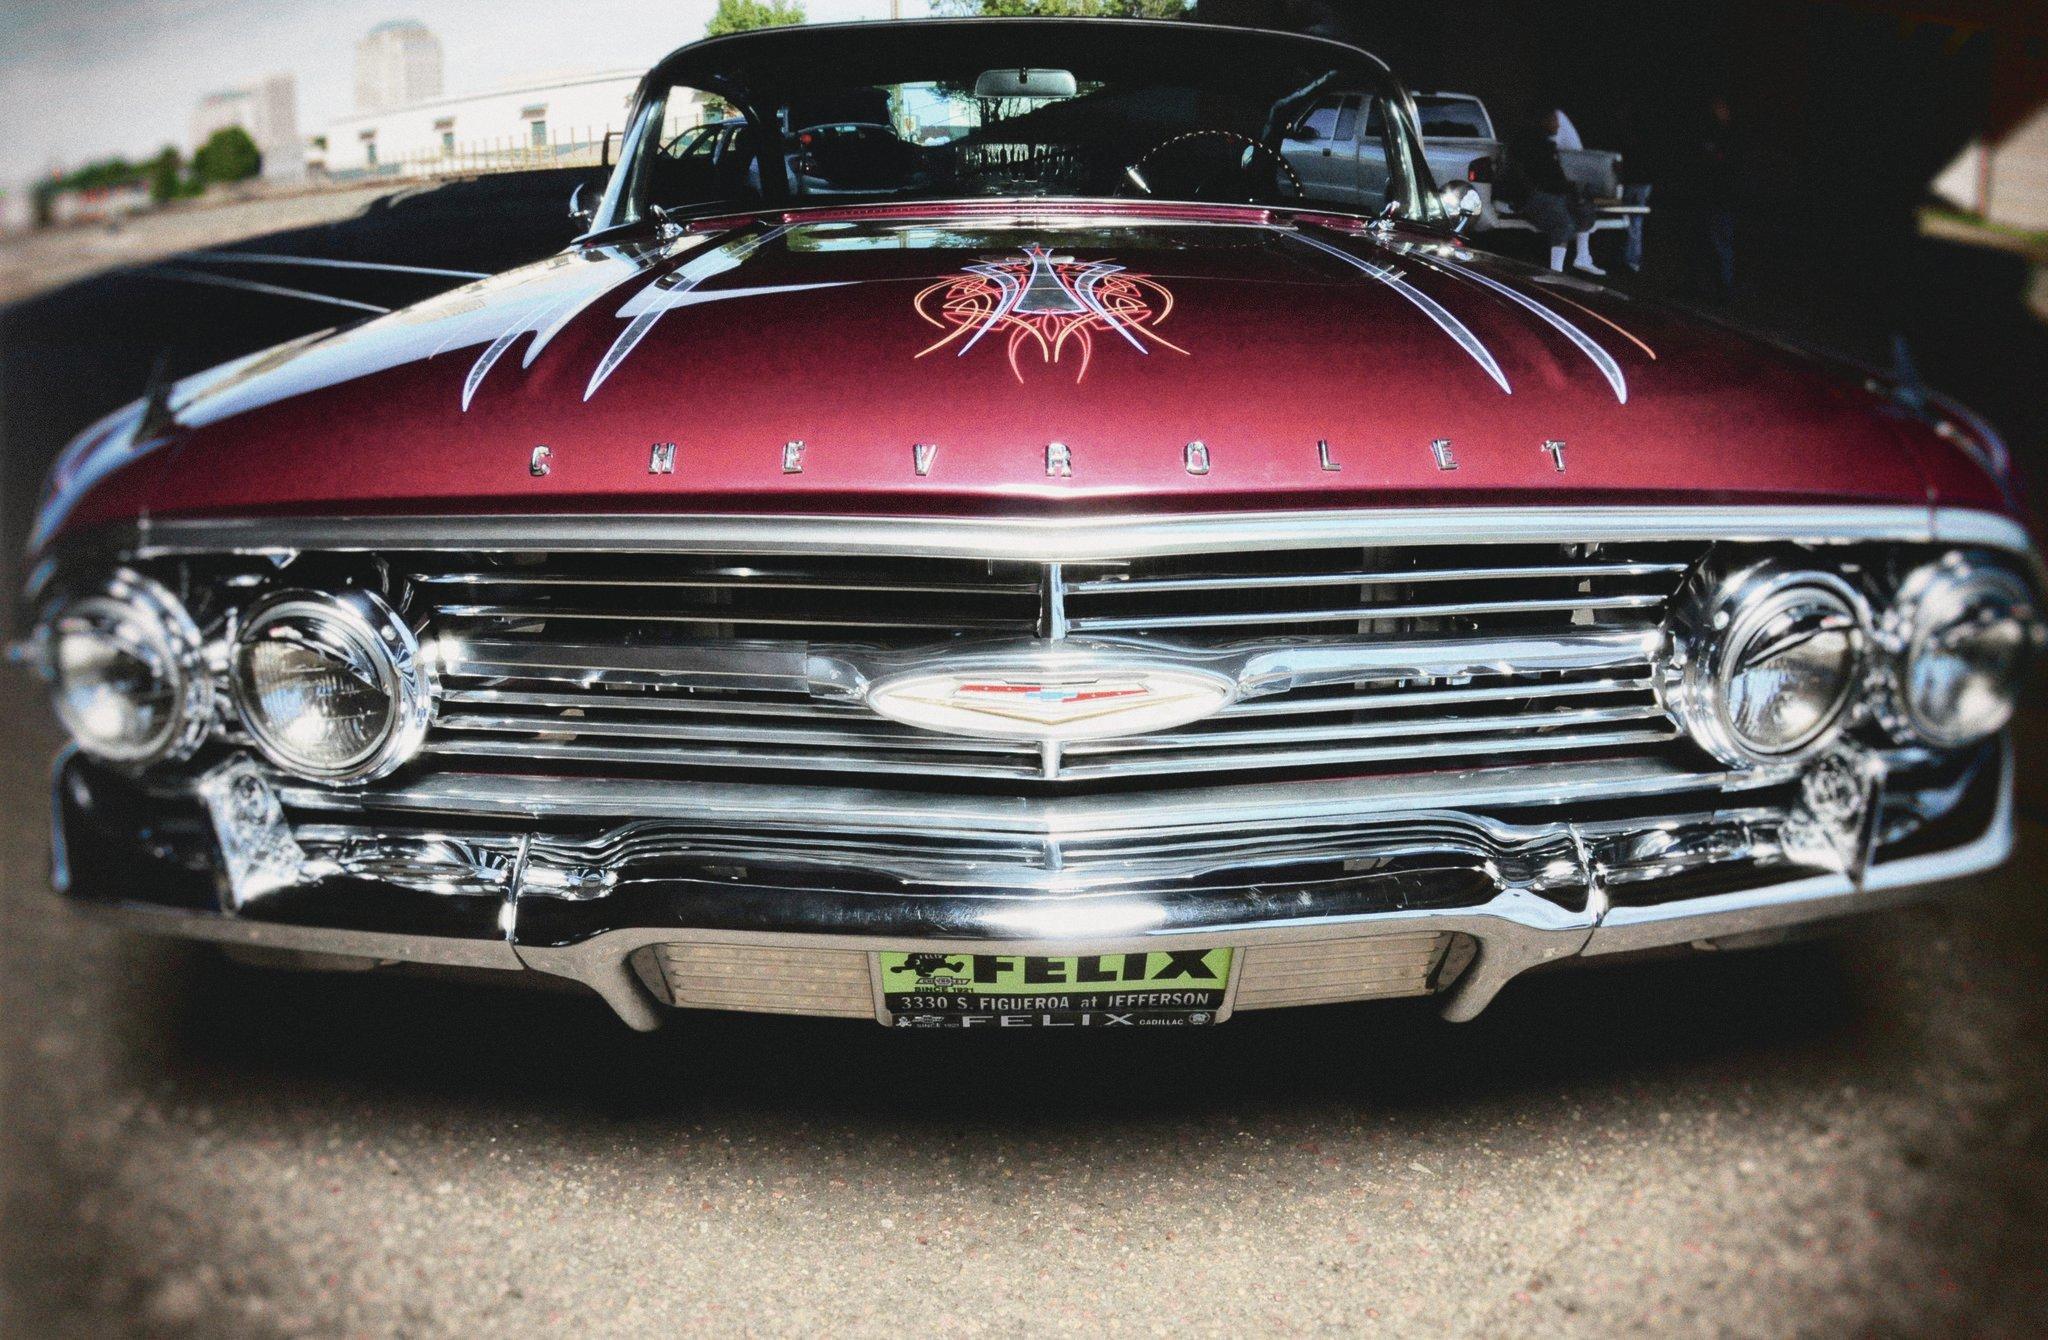 1960 chevrolet impala hardtop talk is cheap lowrider